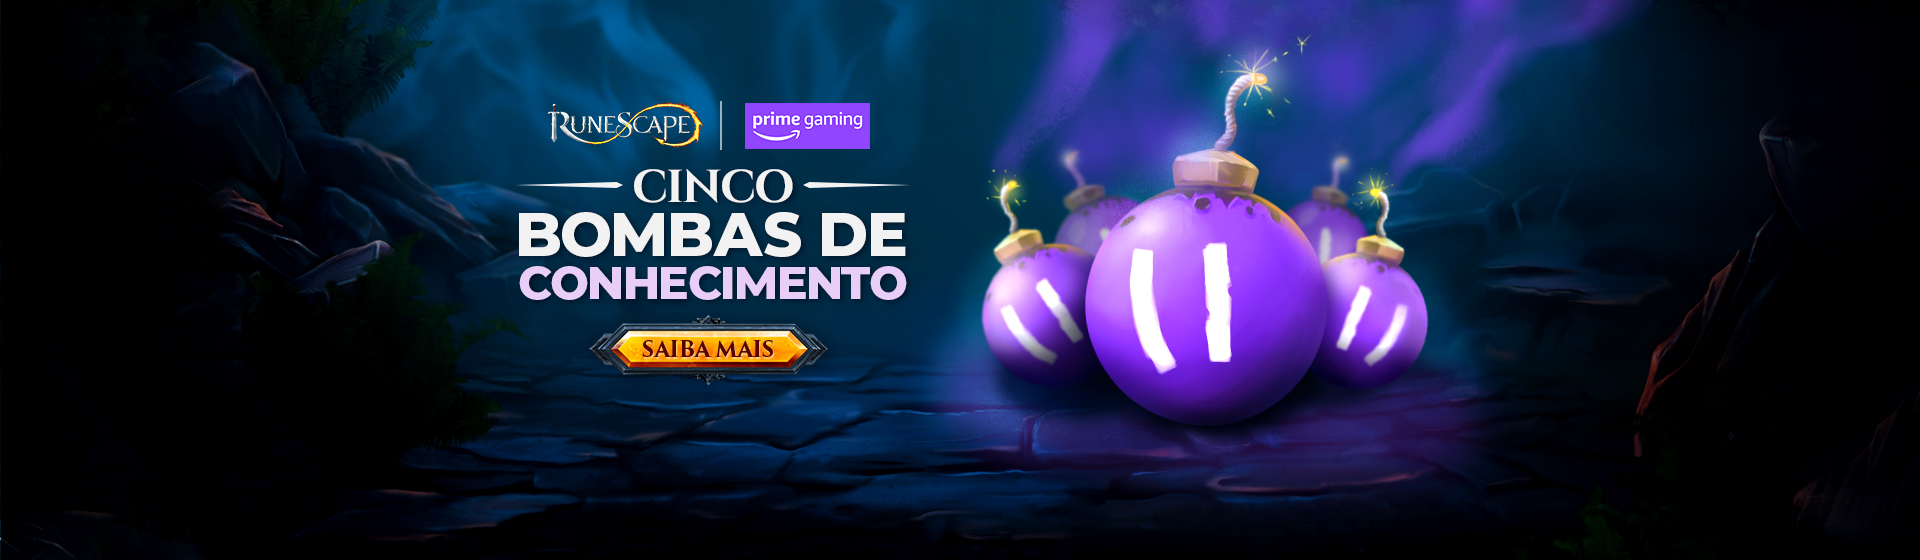 Twitch Prime - Janeiro